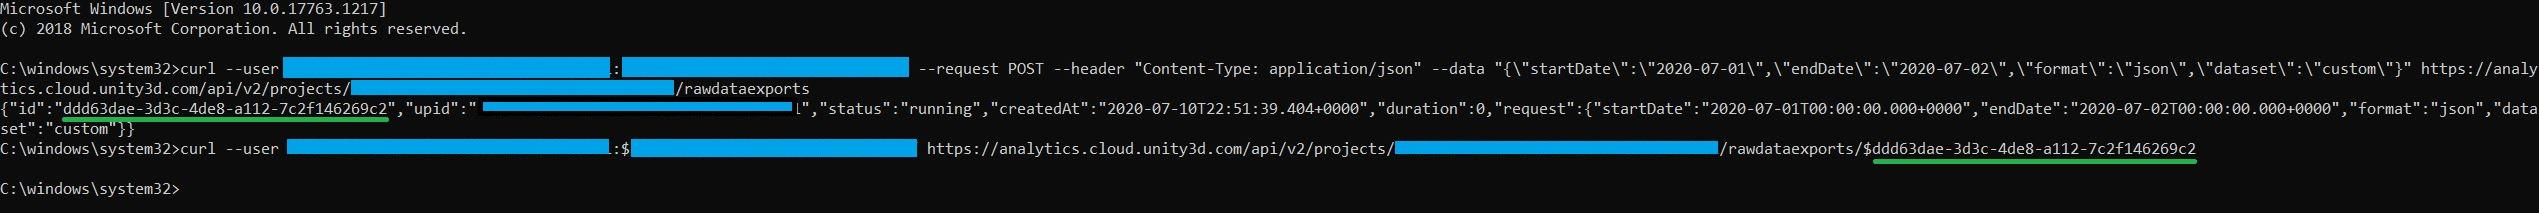 cmd line - Copy.JPG